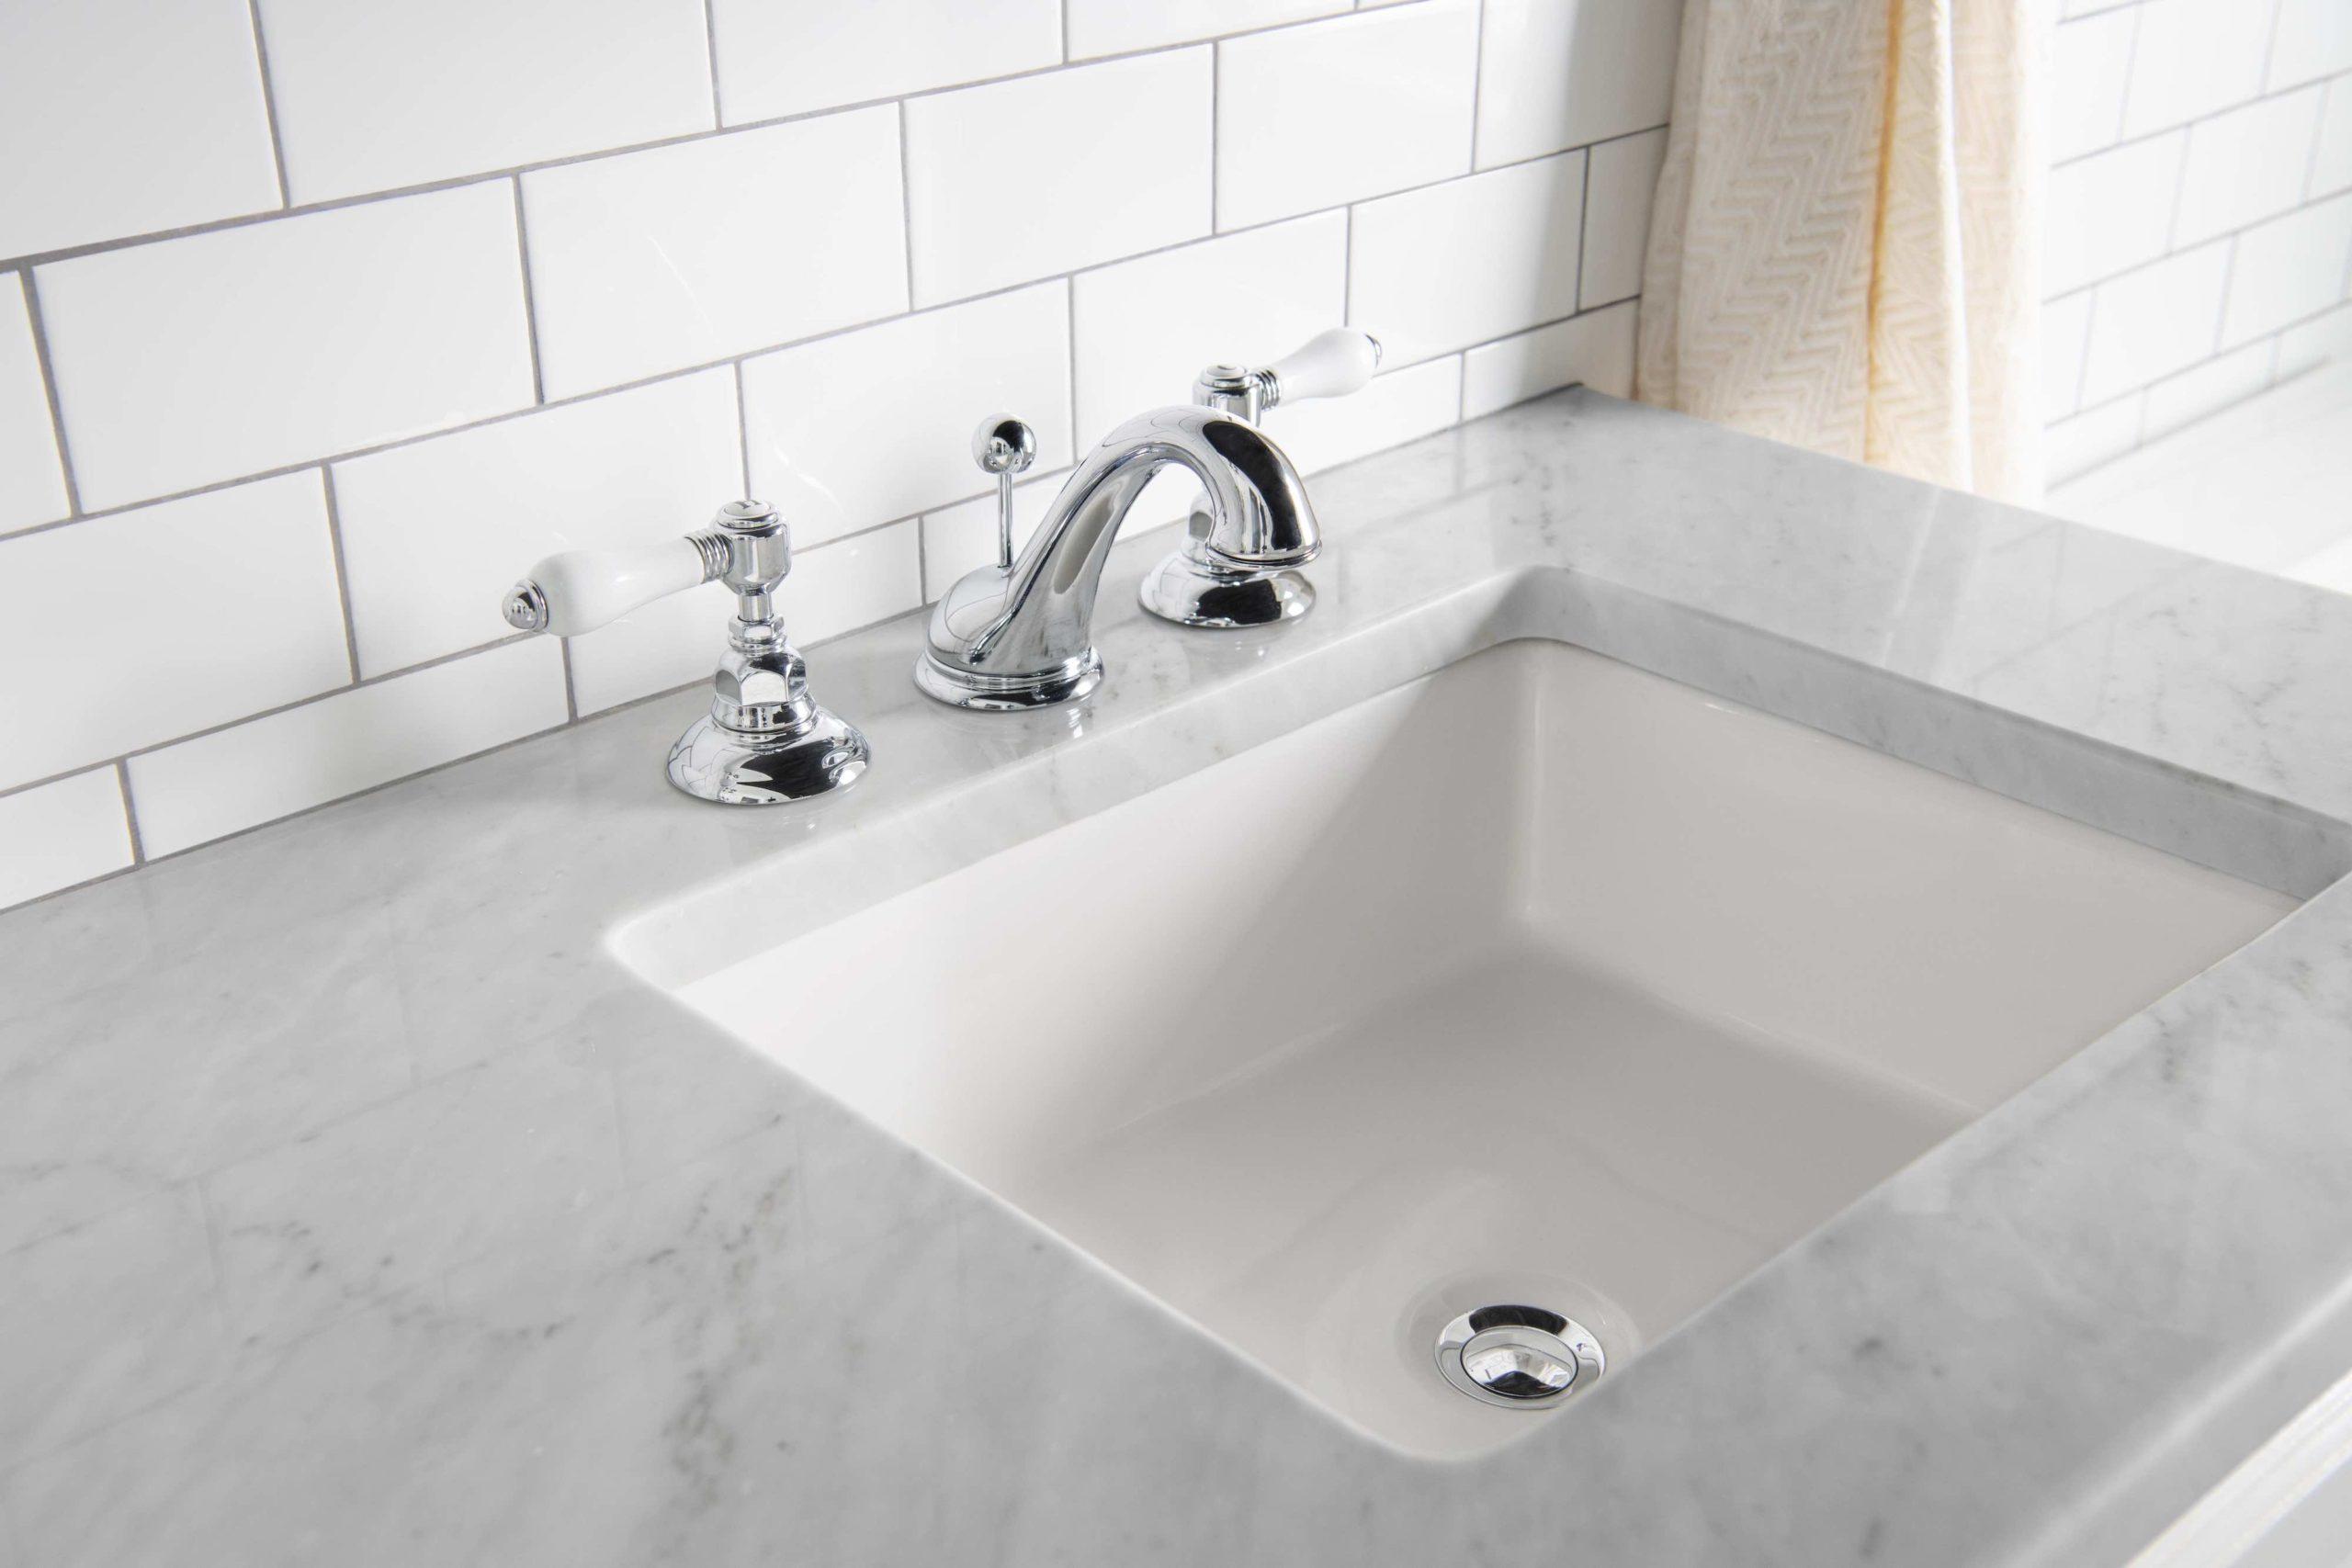 Farmhouse bathroom Sink/Faucet